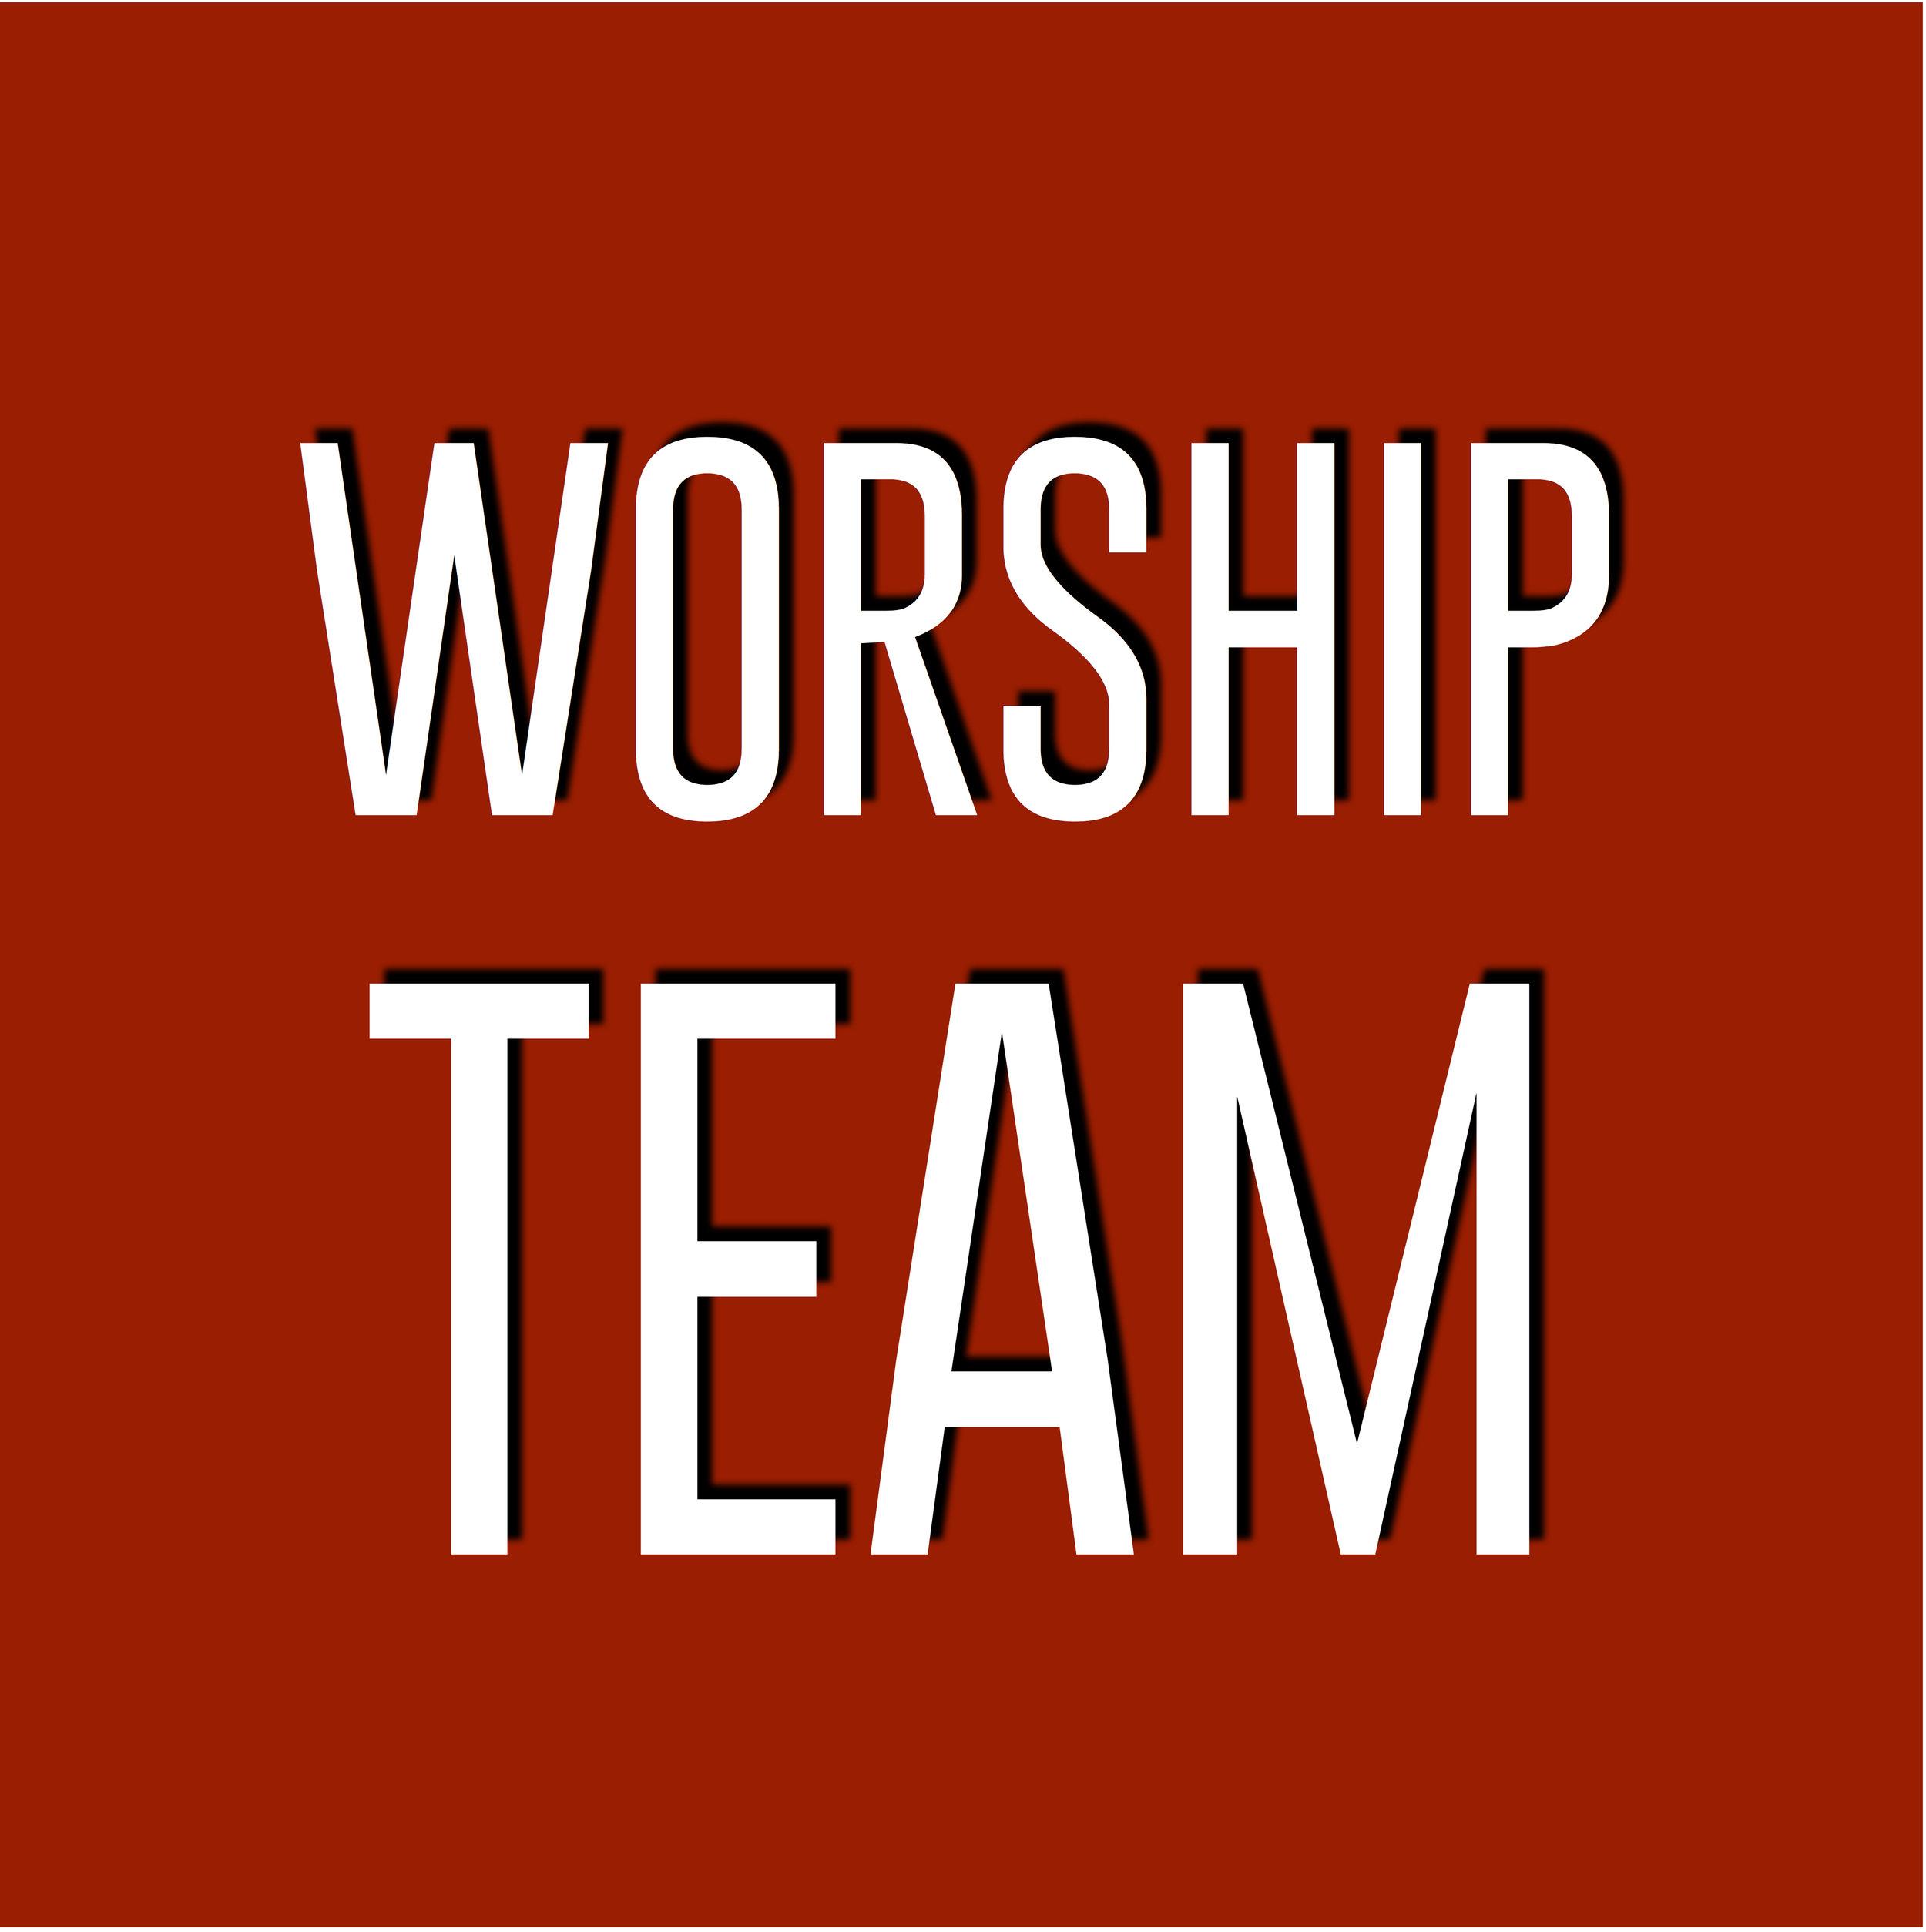 Worship Team.jpeg